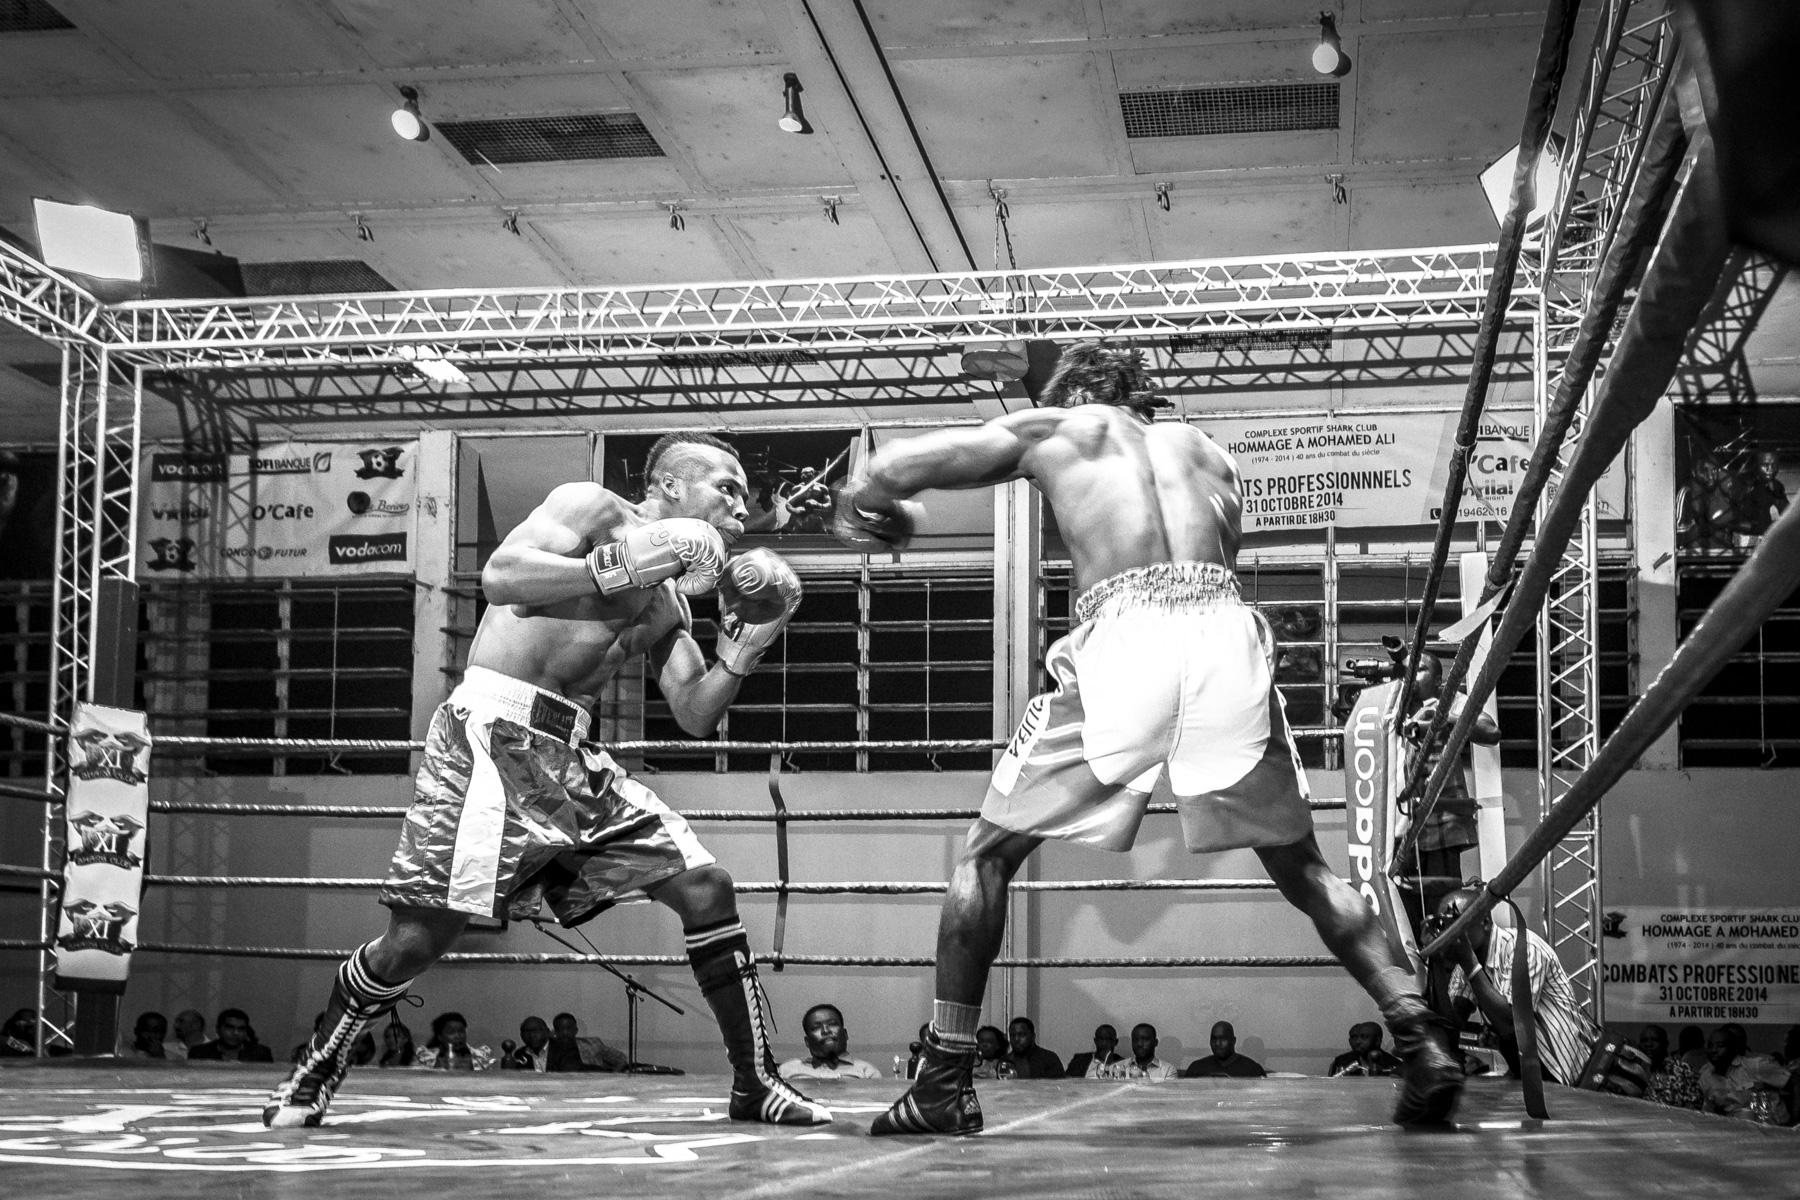 Le boxeur Abouba Kabeya, pendant son combat. Kinshasa, octobre 2014.